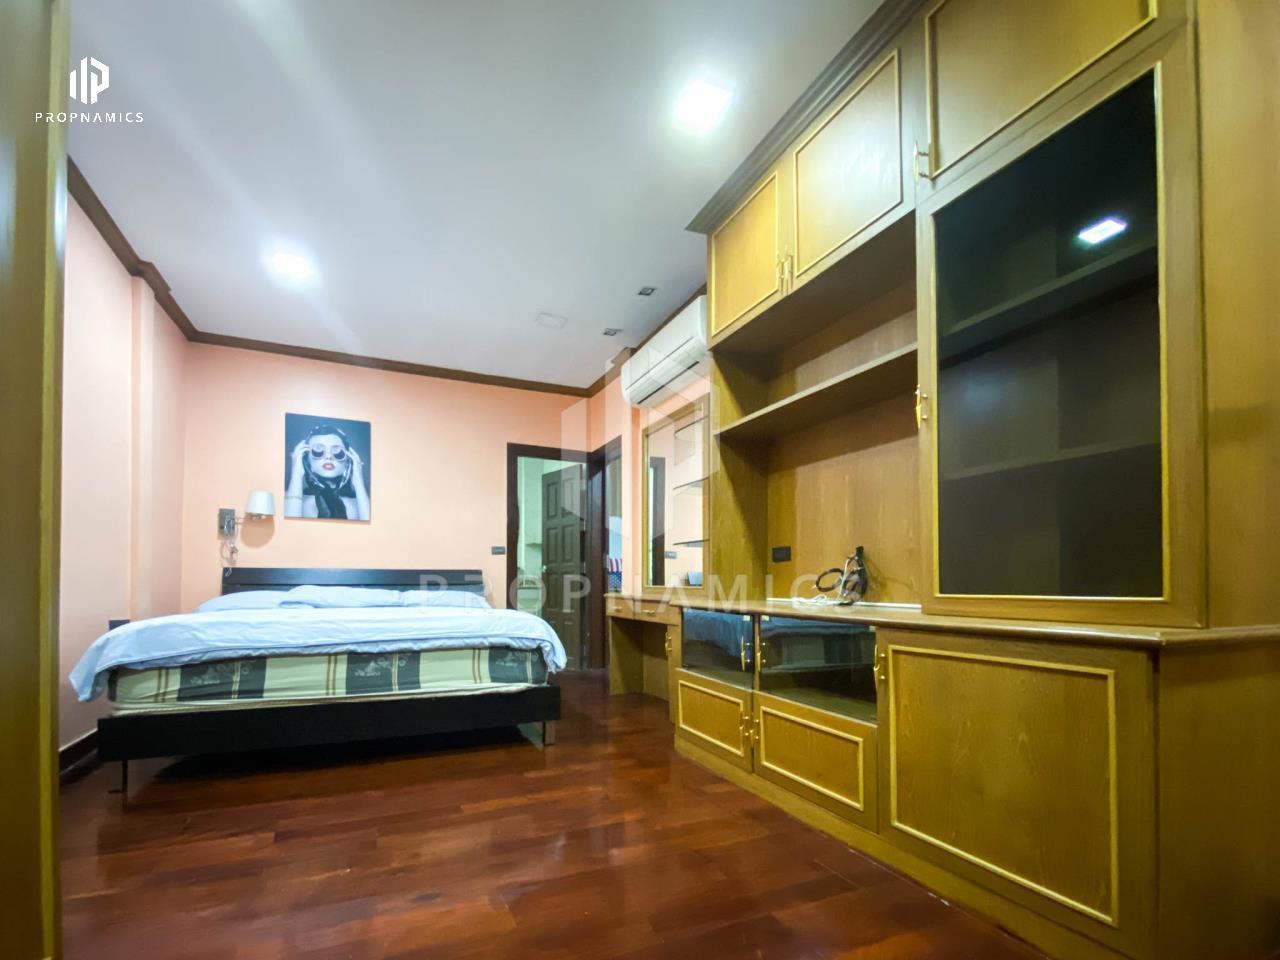 Propnamics Co., Ltd Agency's FOR RENT: SINGLE HOUSE IN SUKHUMVIT 26 19